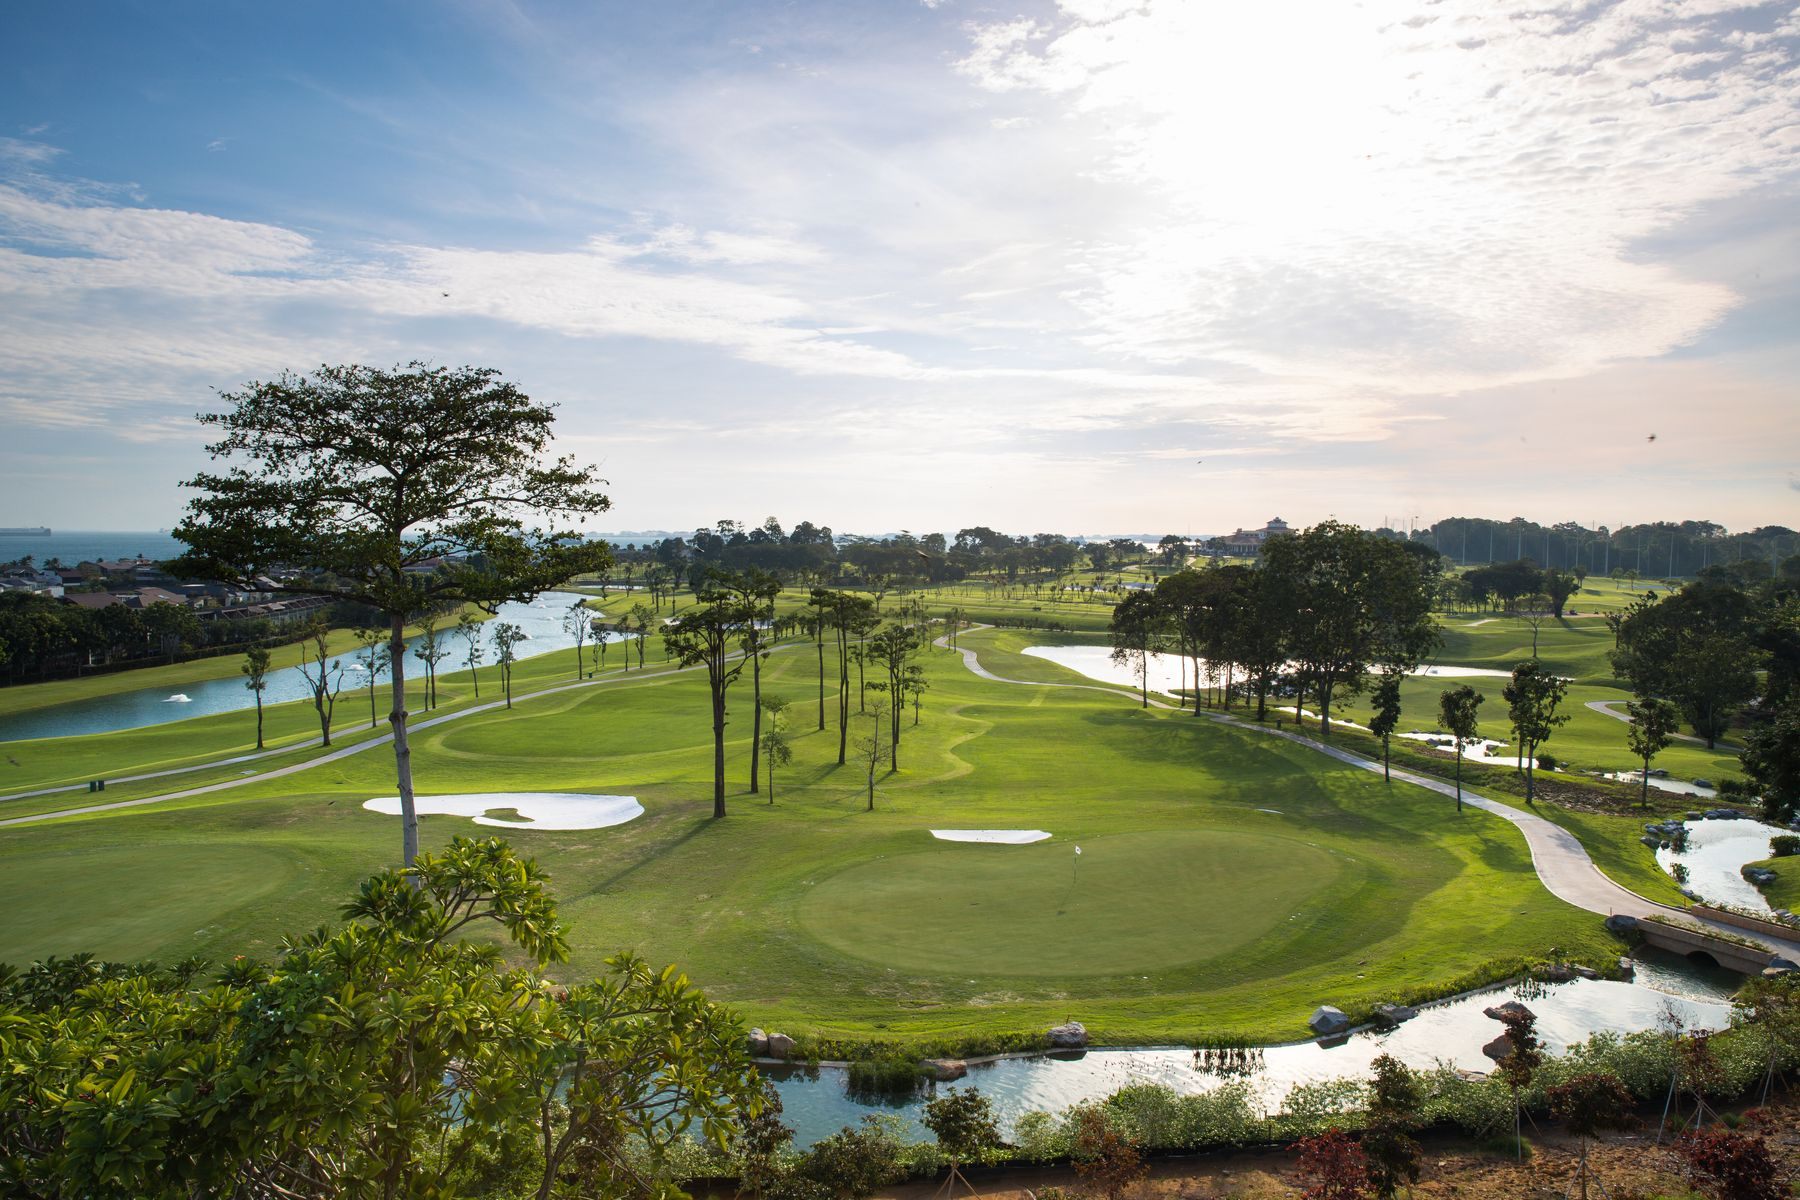 singapur golfplätze